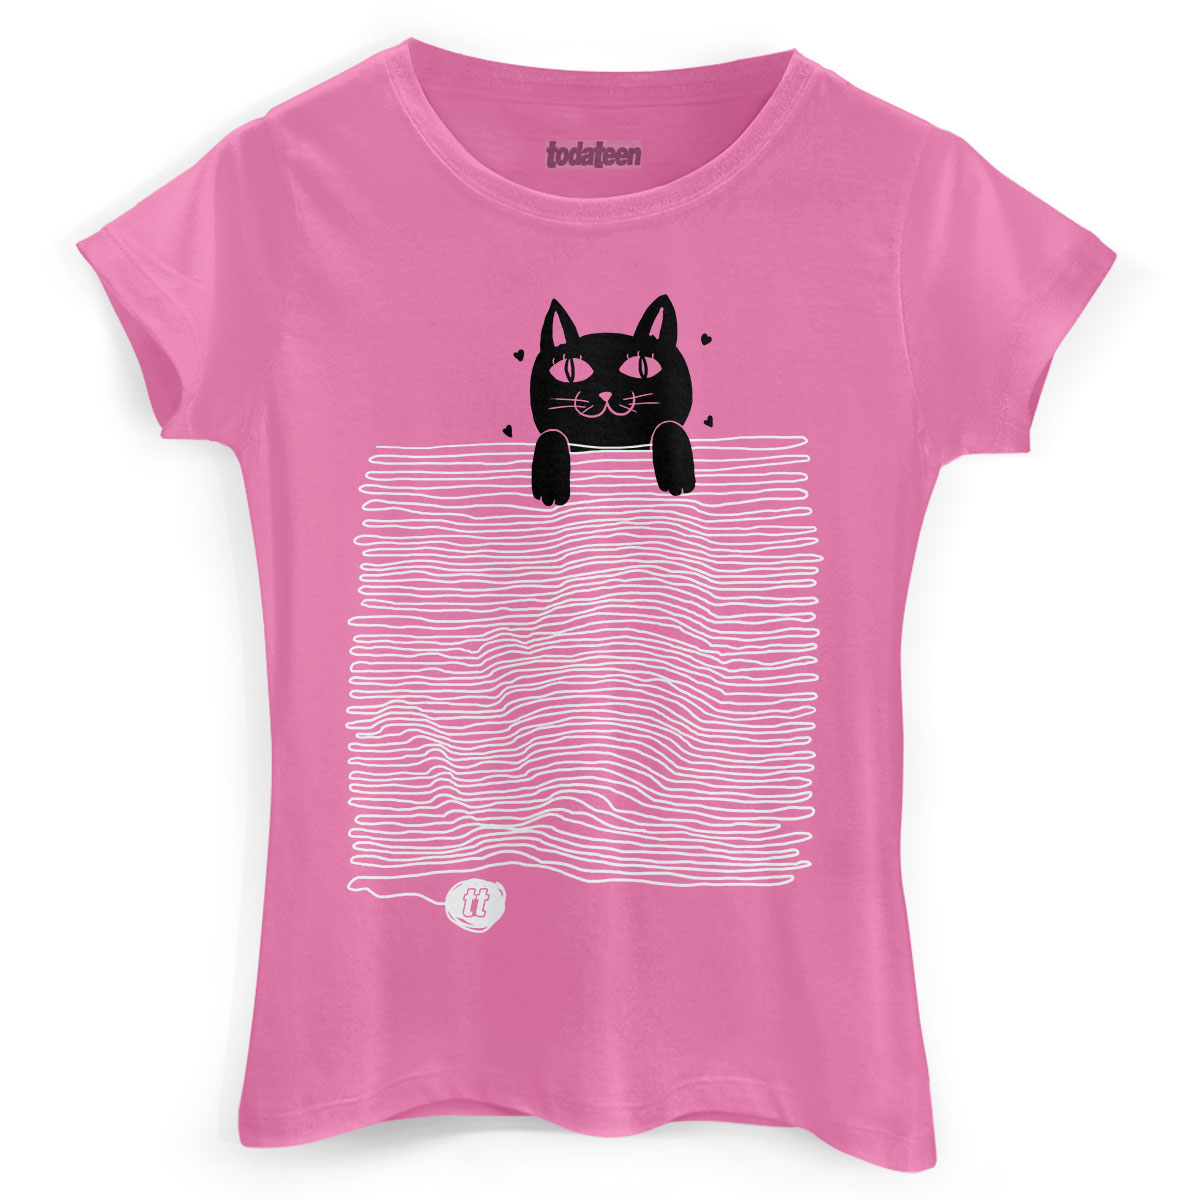 Camiseta Feminina TodaTeen Funny Cat